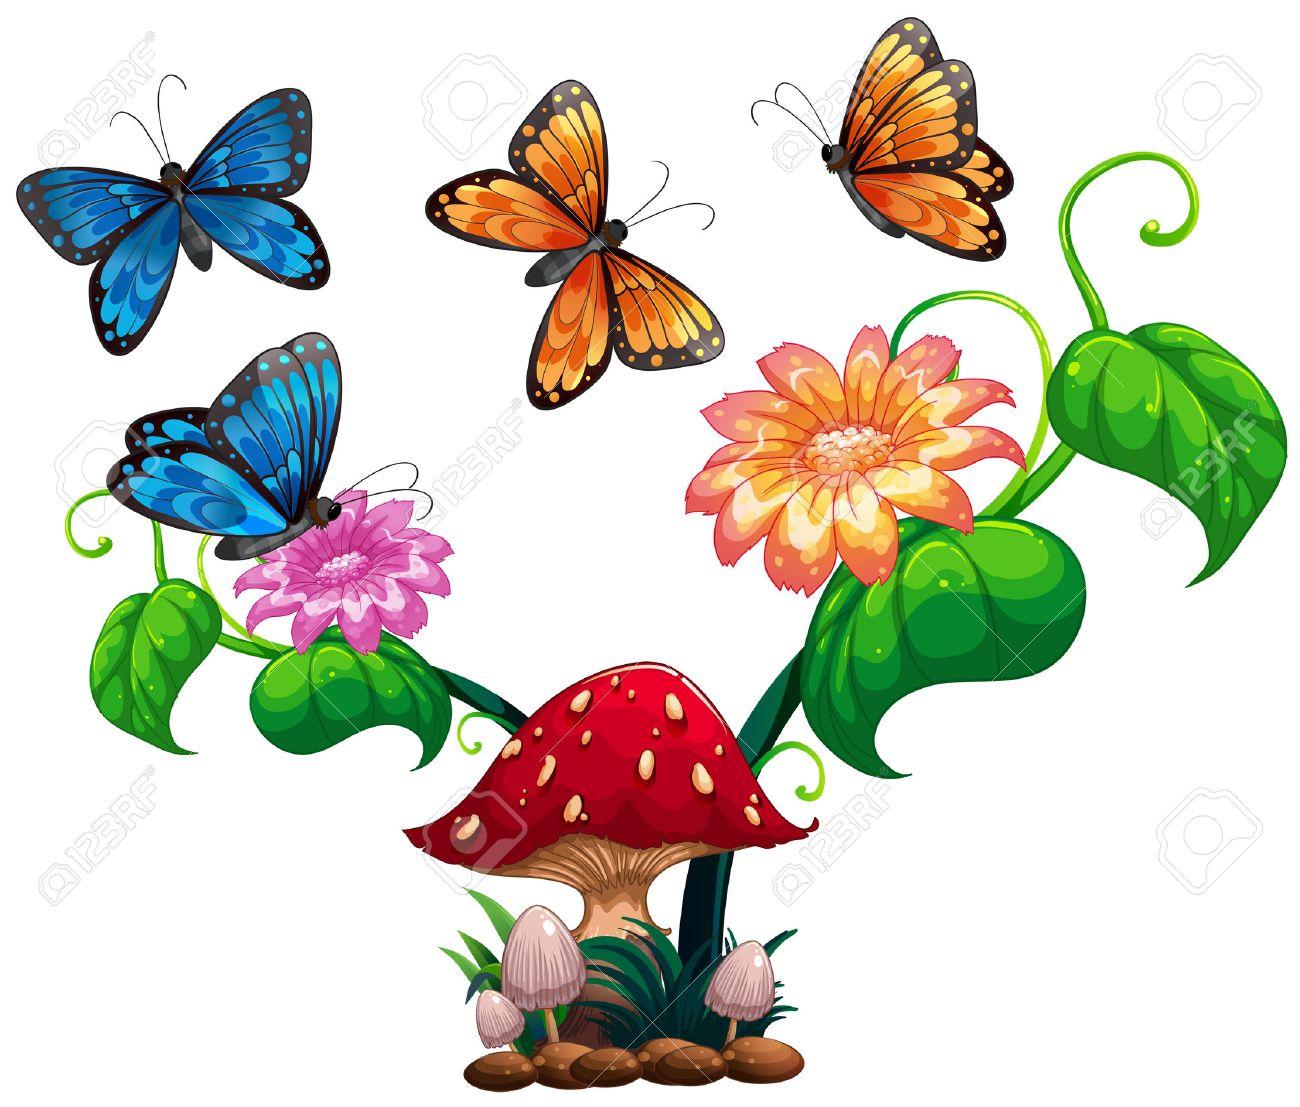 butterflies flying around mushroom and flower illustration royalty